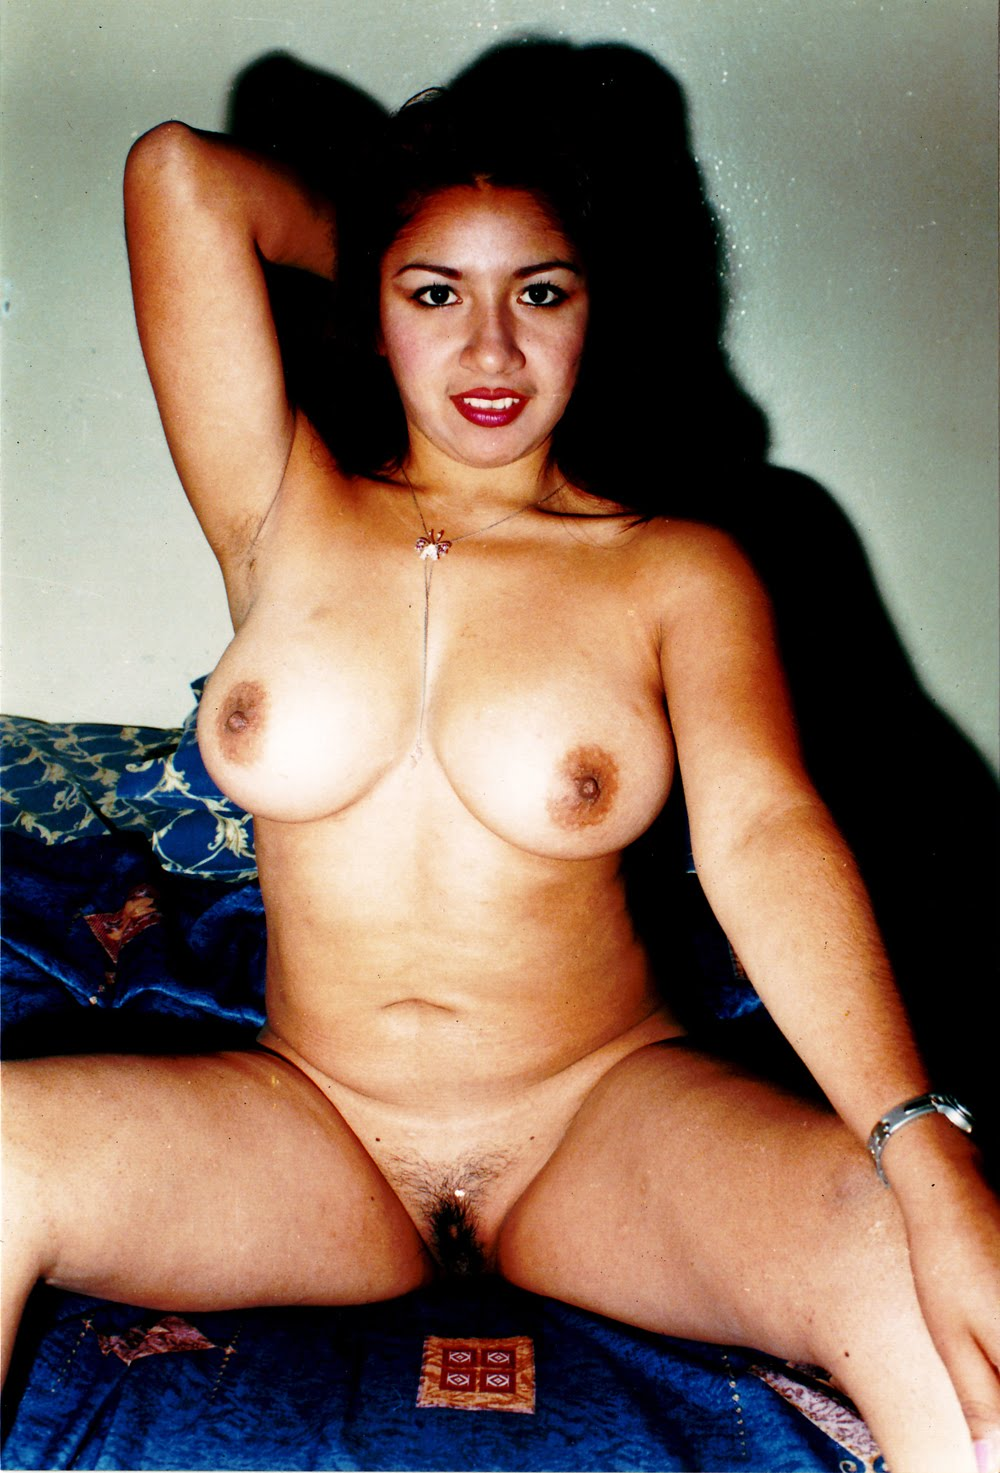 Peruana Porno Daysi Araujo Fotos Y Videos Desnuda Calata Seo